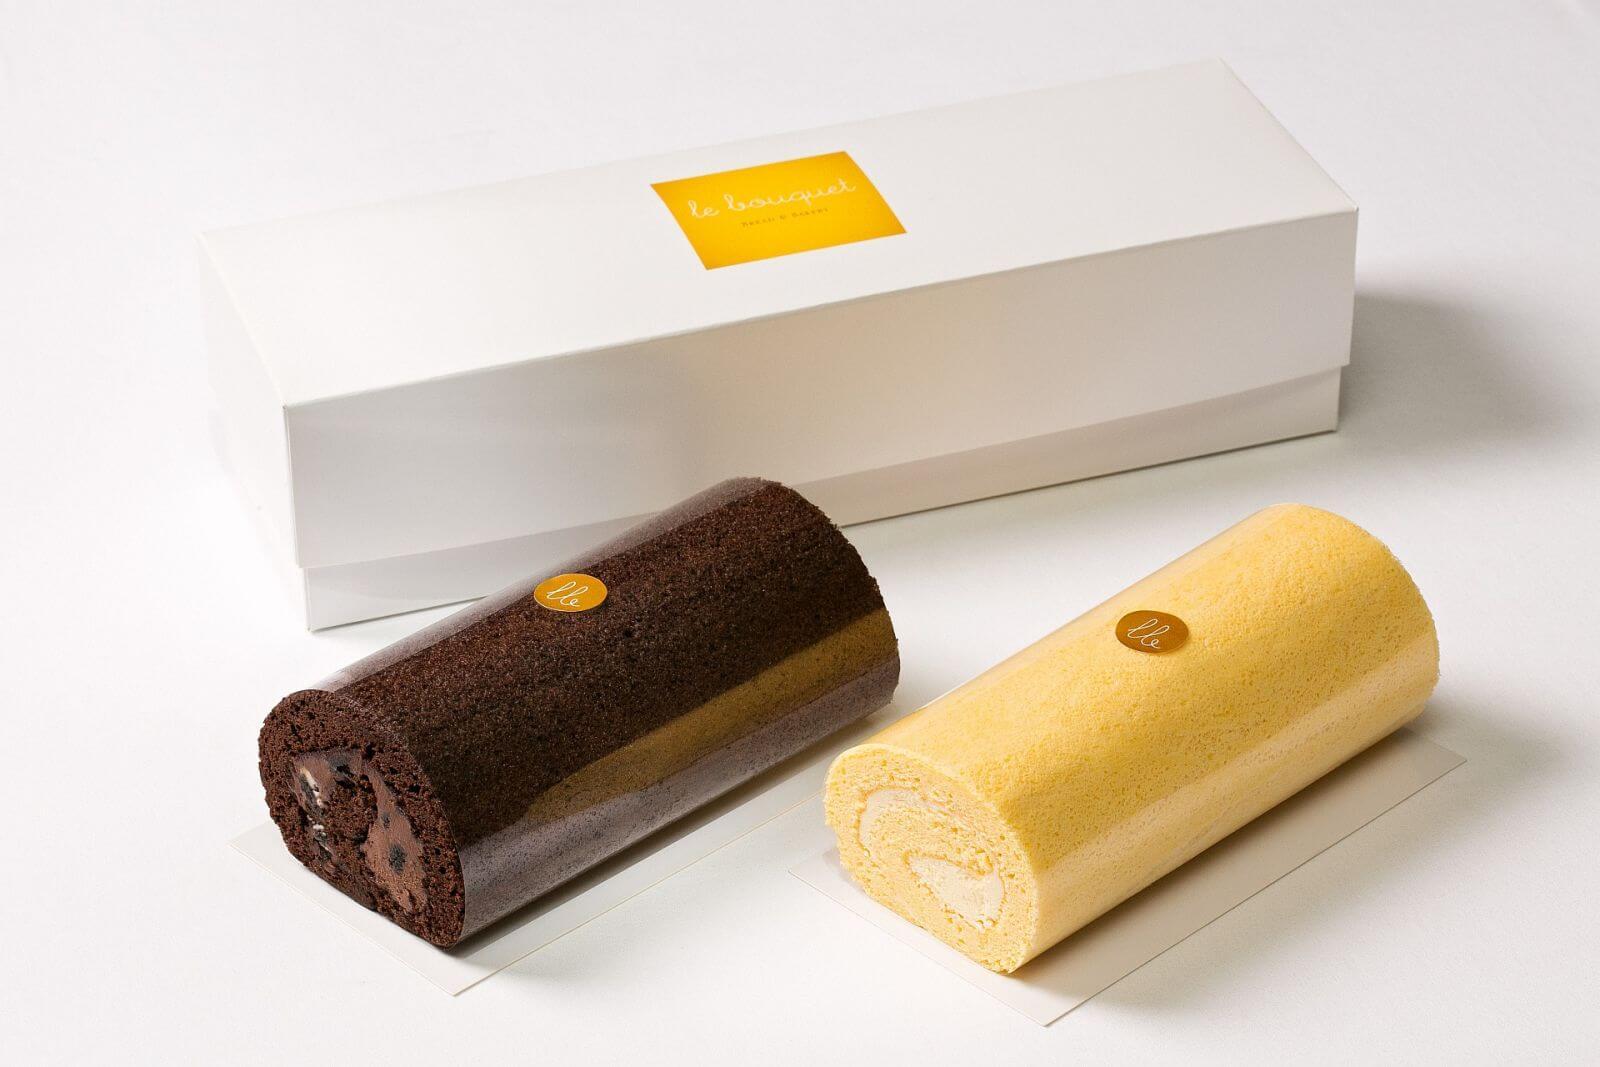 Corner Bakery 63 國賓麵包房巧克力OREO蛋糕捲